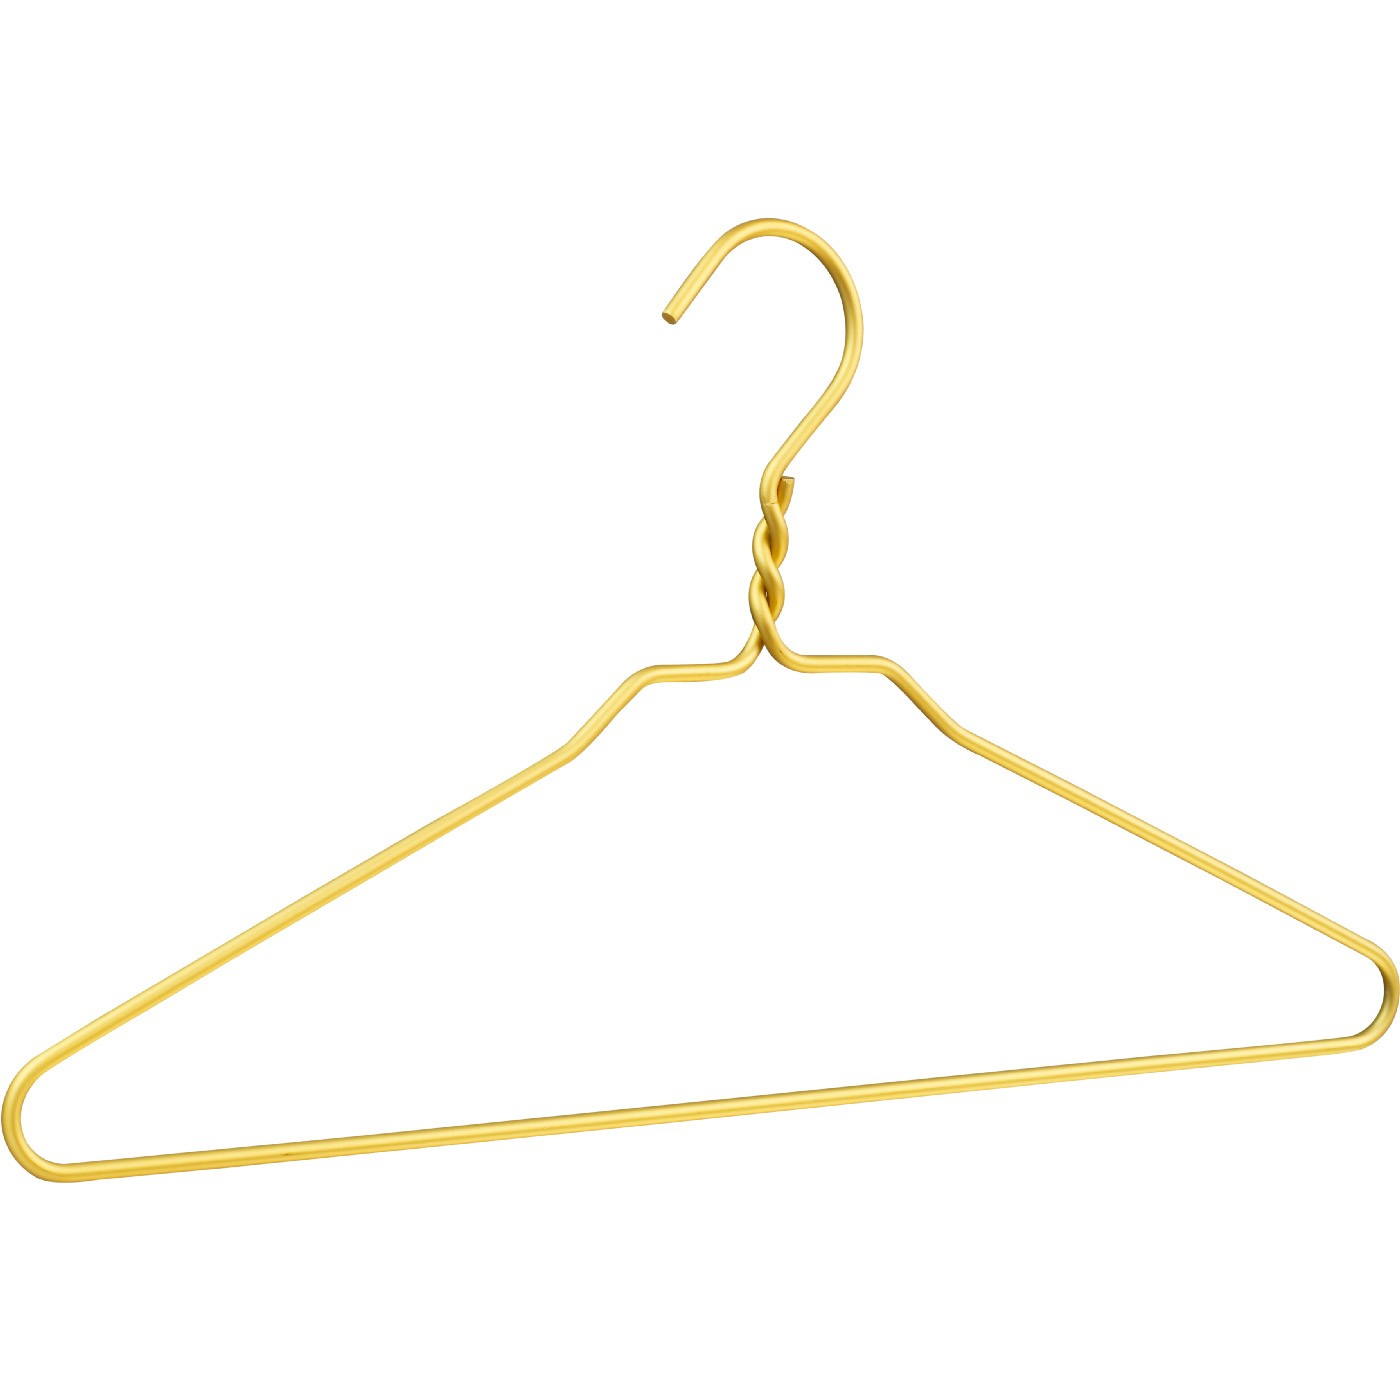 garderobenb gel pieperconcept dry cleaner gold. Black Bedroom Furniture Sets. Home Design Ideas